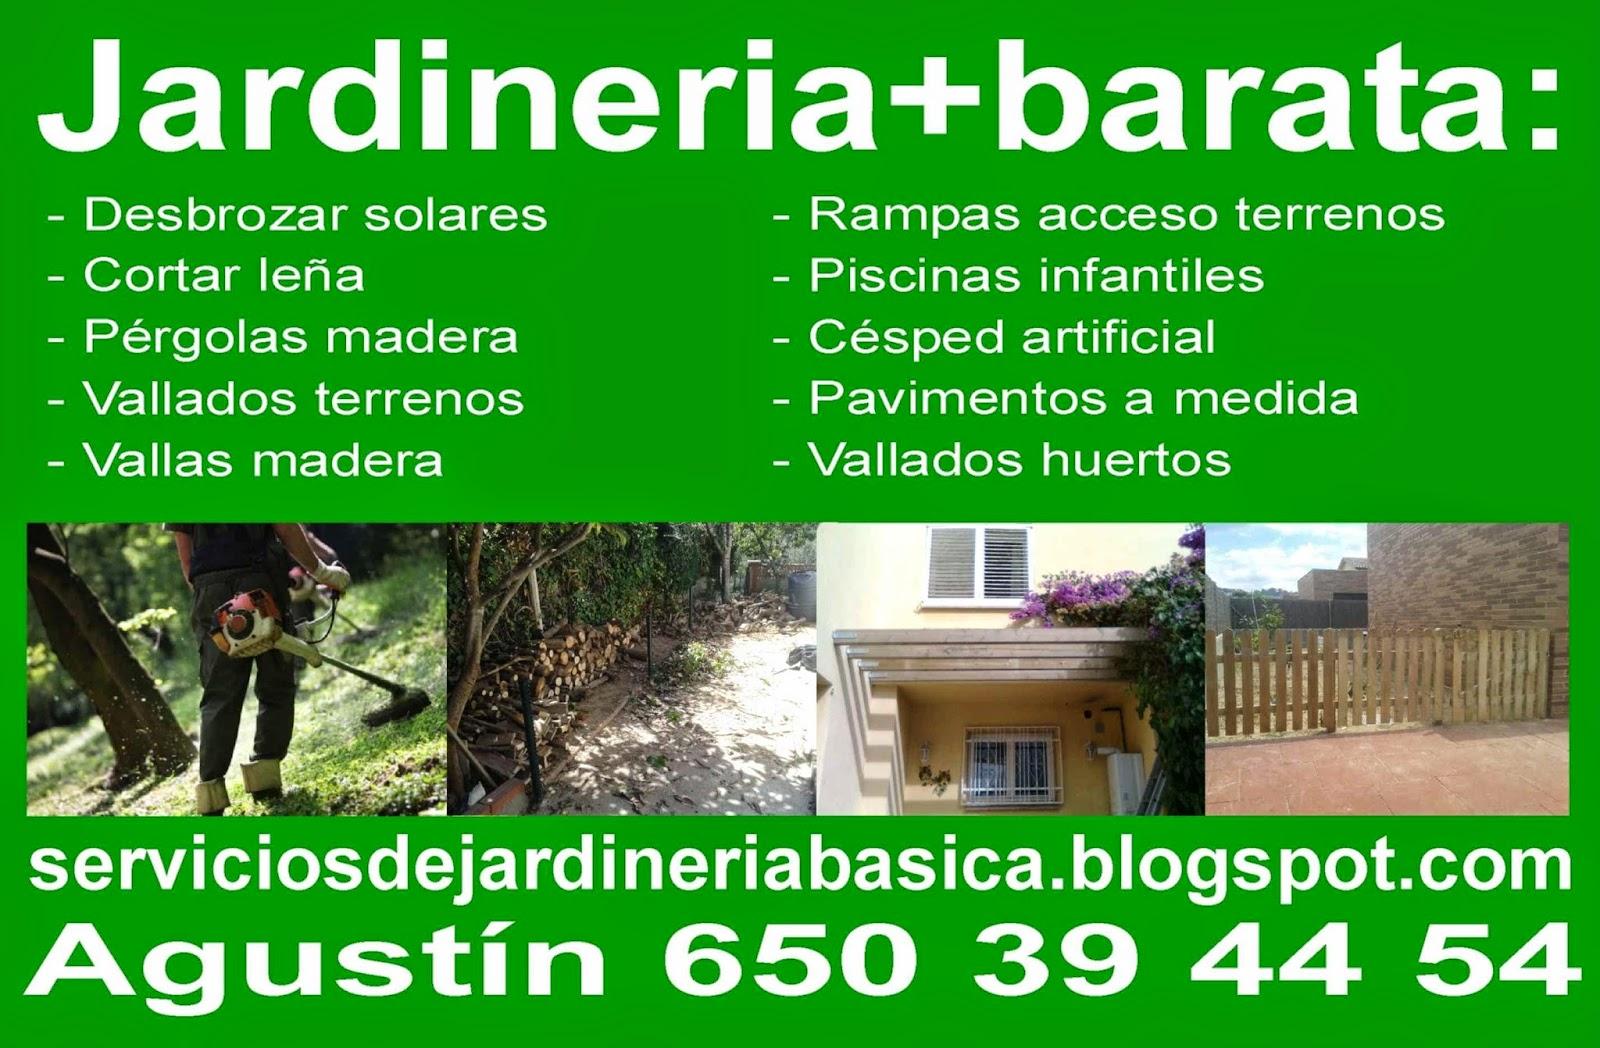 Serviciosdejardineriabasica jardineria barata atenci n for Jardineria barata barcelona